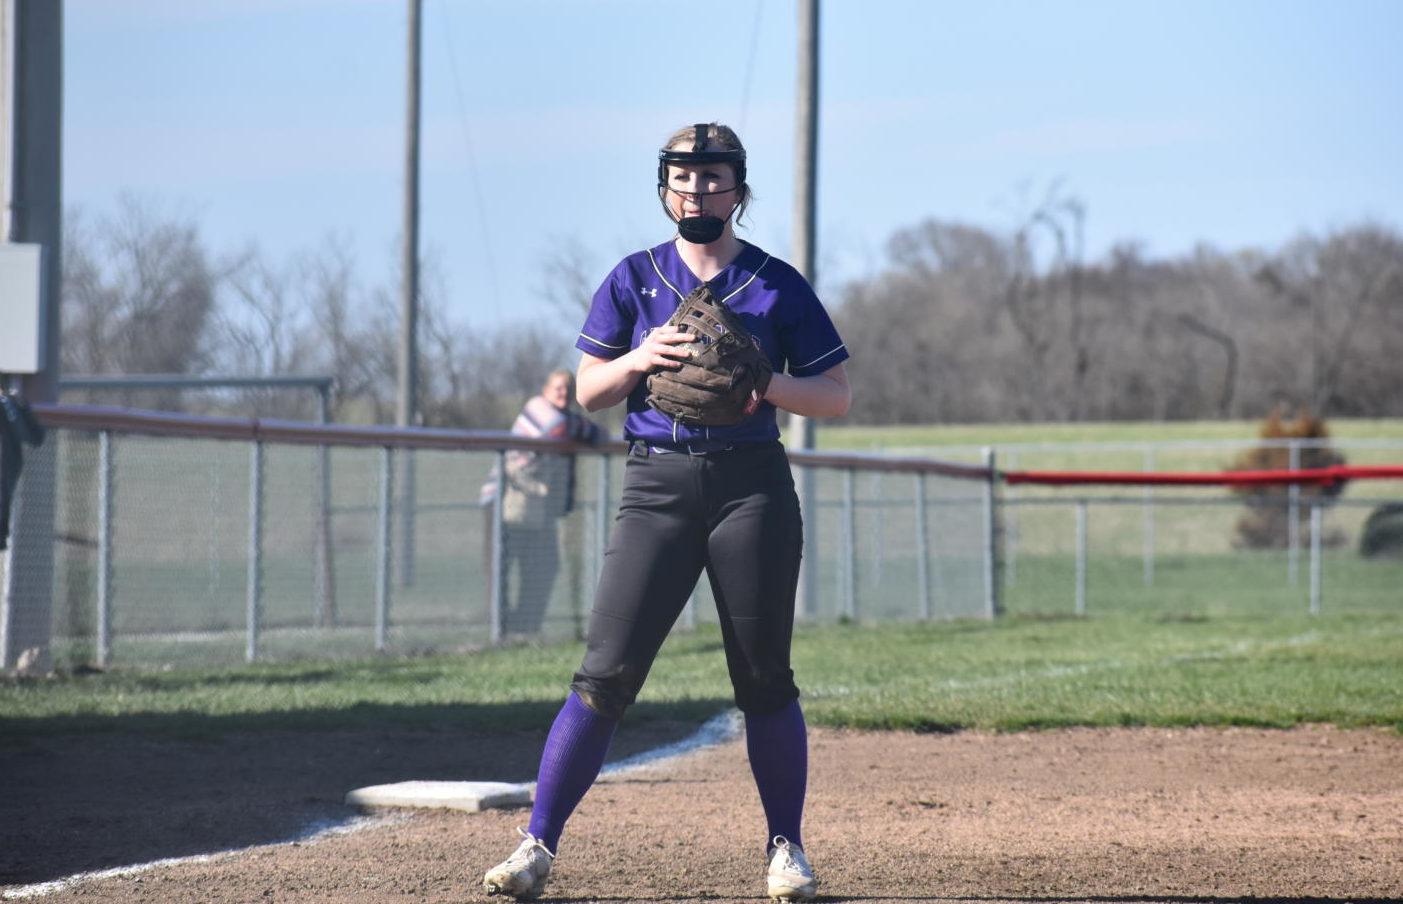 Ryah Icenhower [12] plays 3rd base